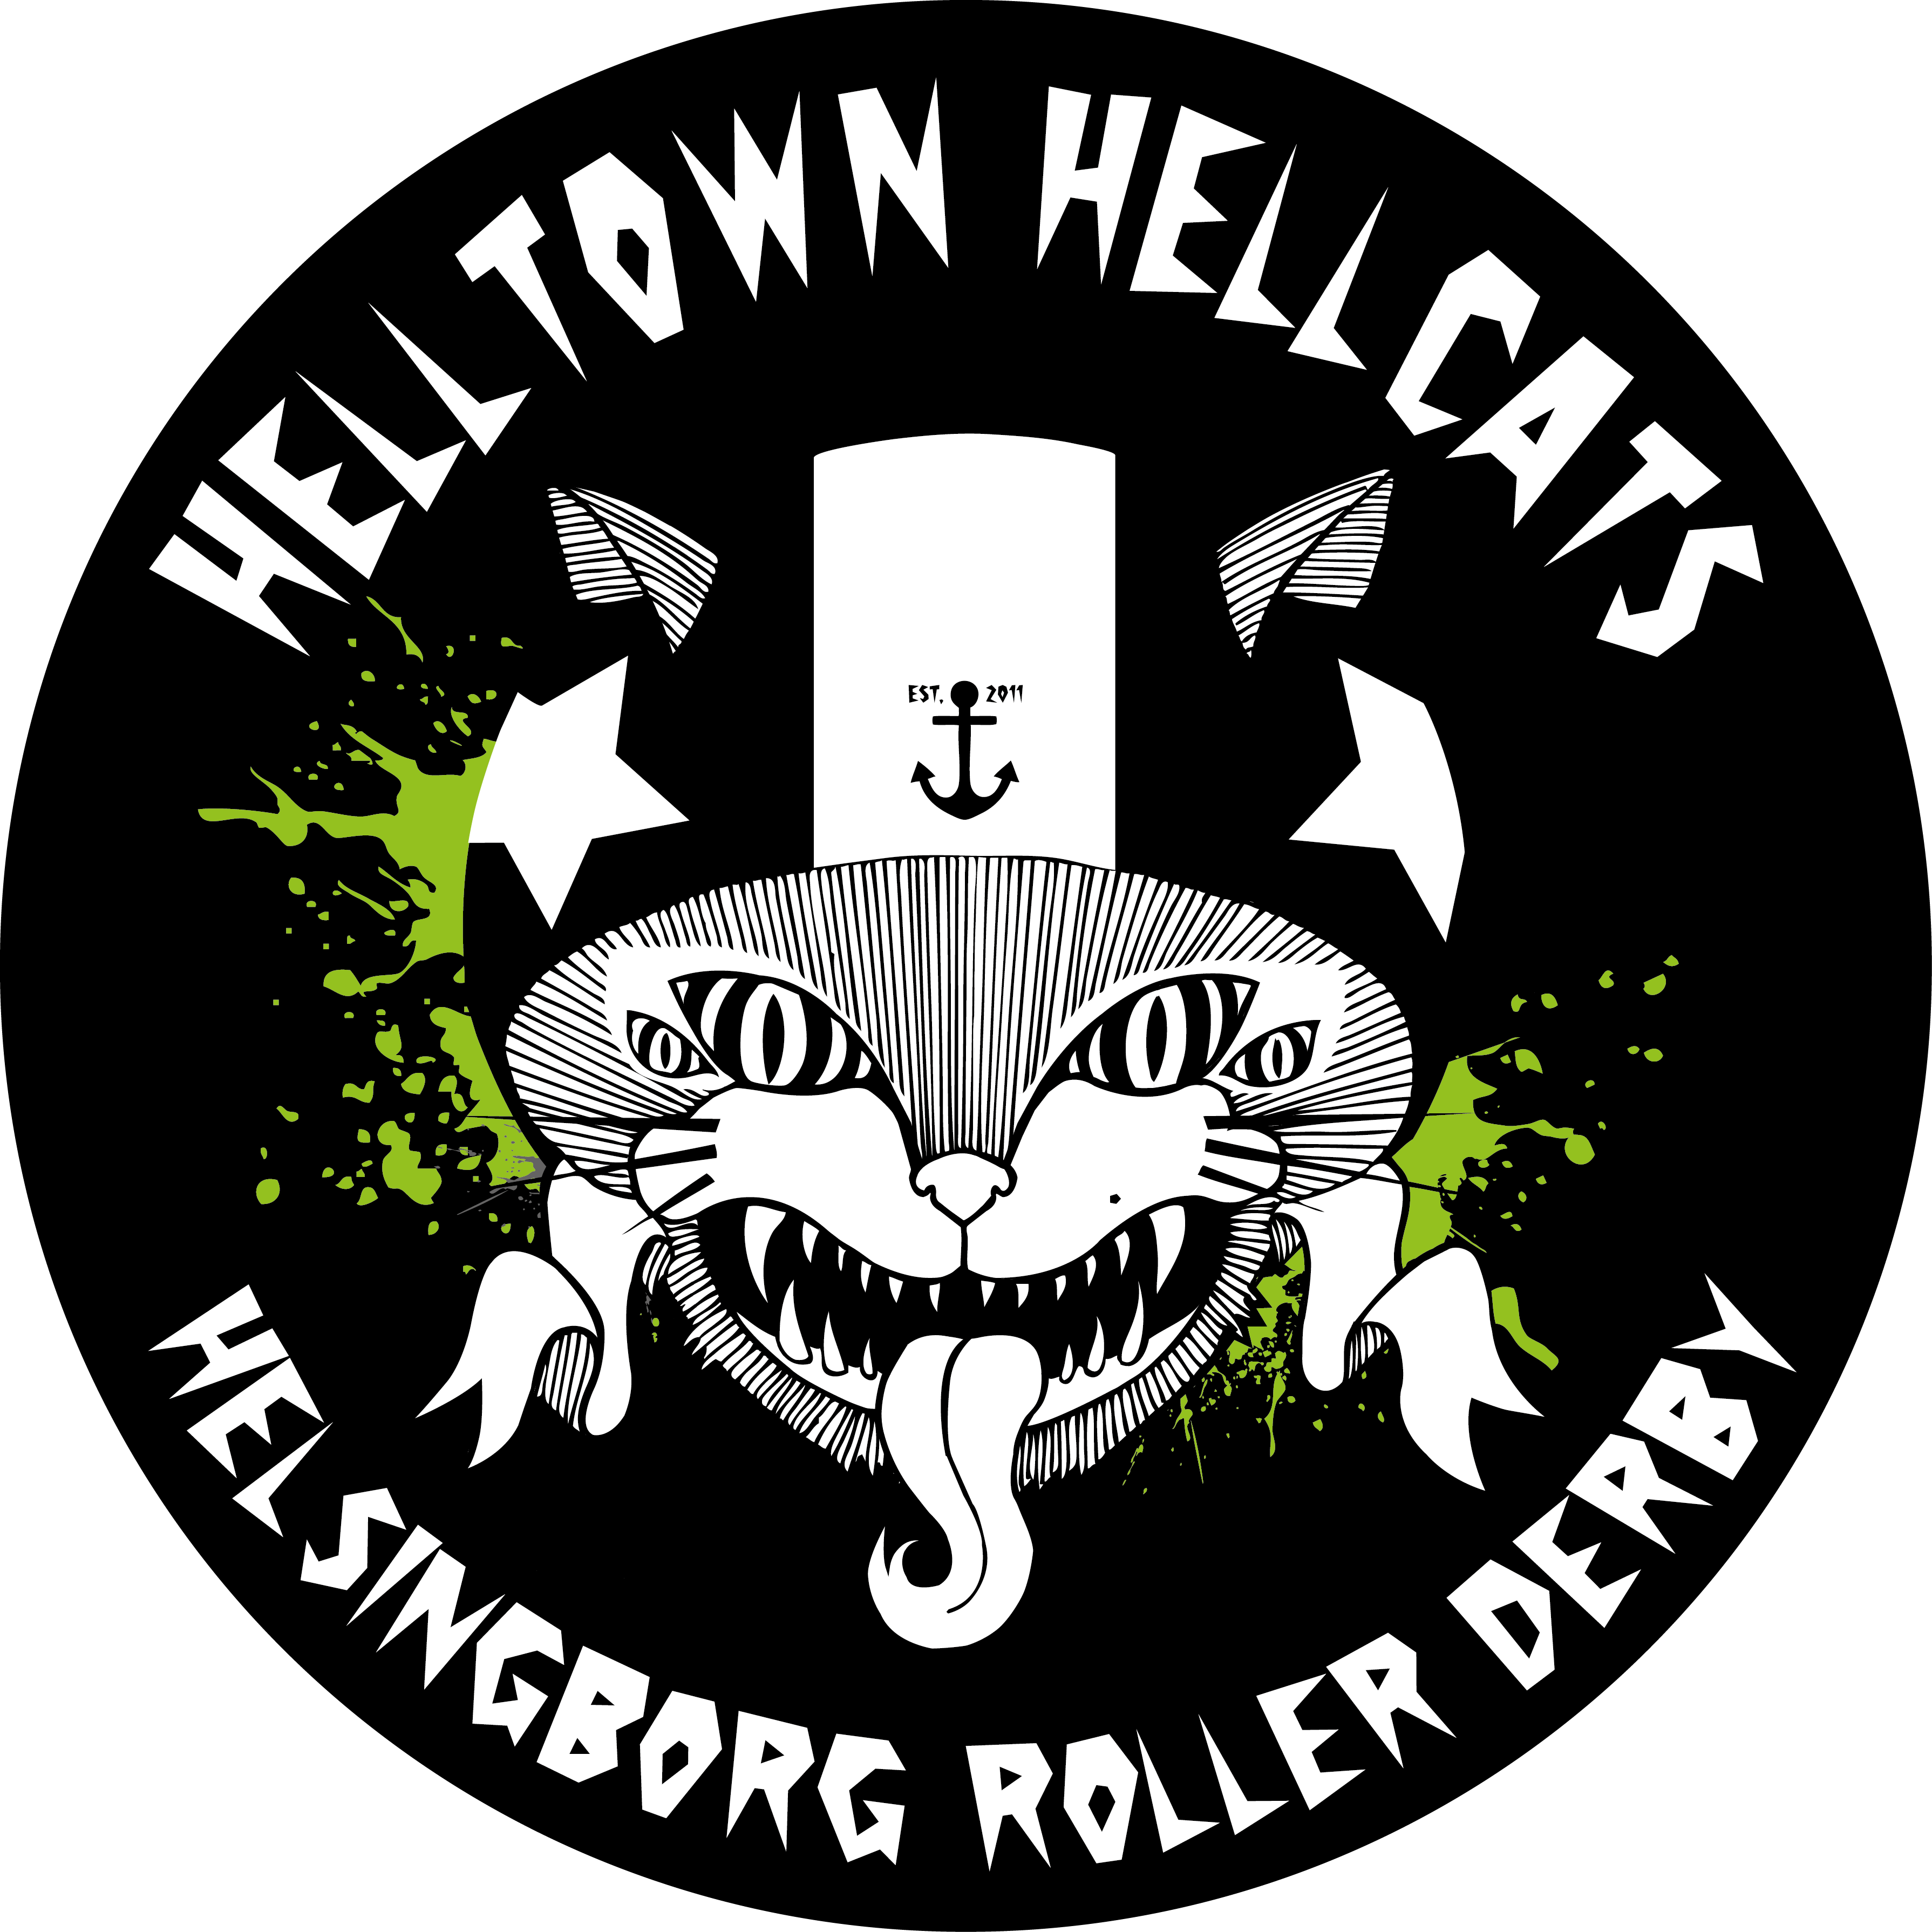 Helltown Hellcats